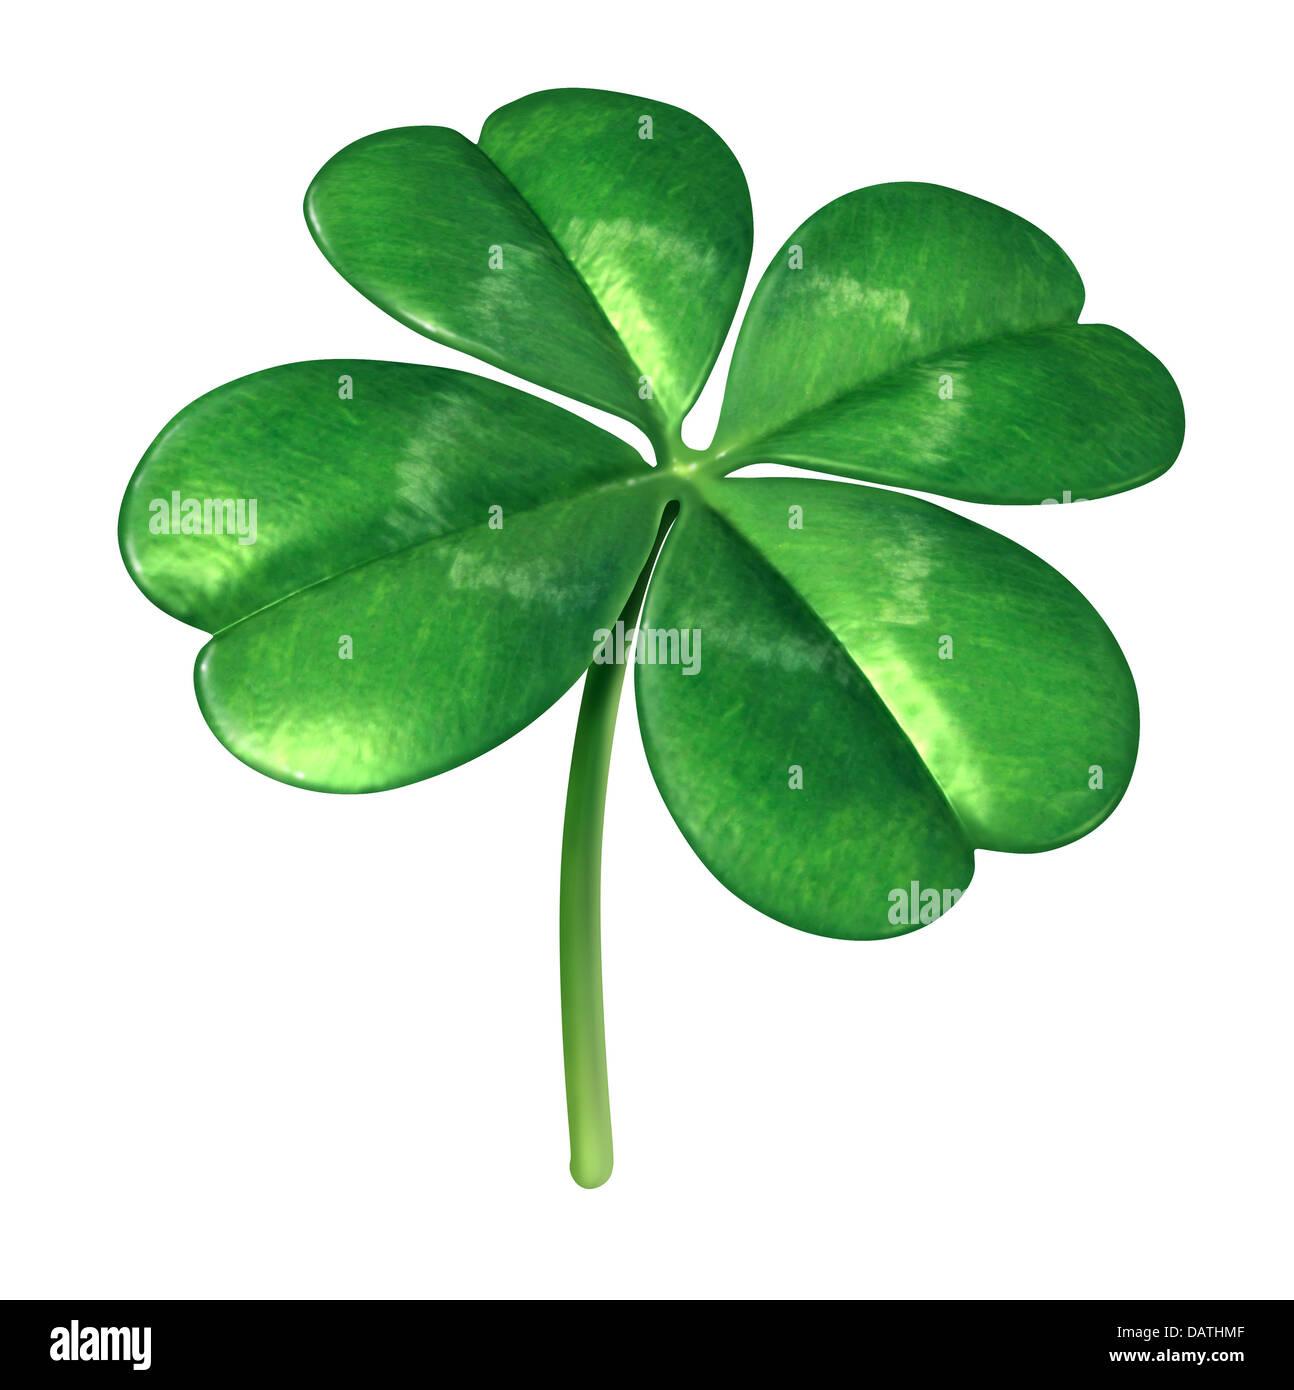 Four leaf clover plant as an Irish symbol for a green lucky charm